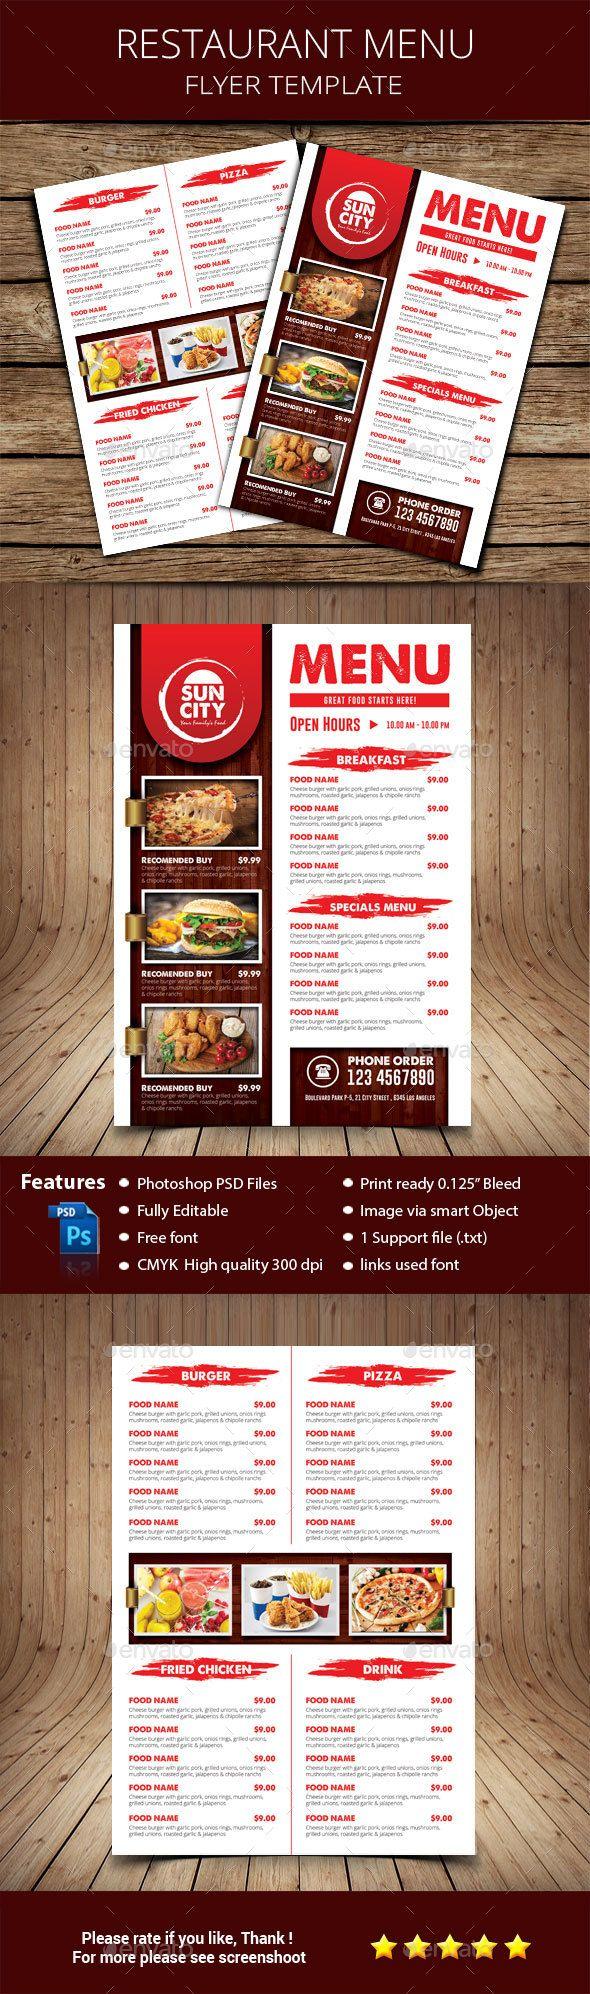 #Rustic #Restaurant #Menu Flyer - Restaurant Flyers